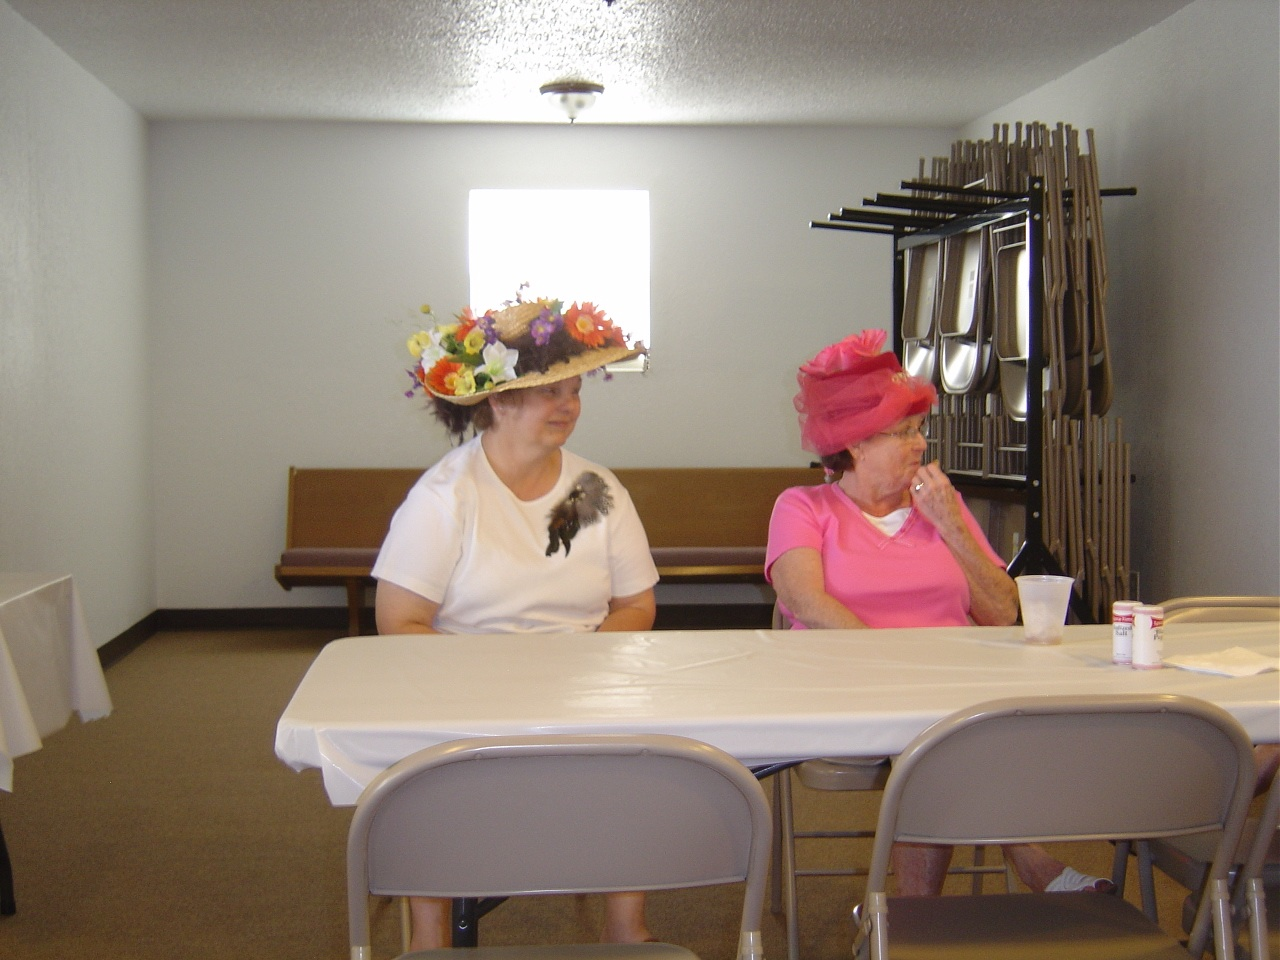 baptist church first lady speeches | just b.CAUSE